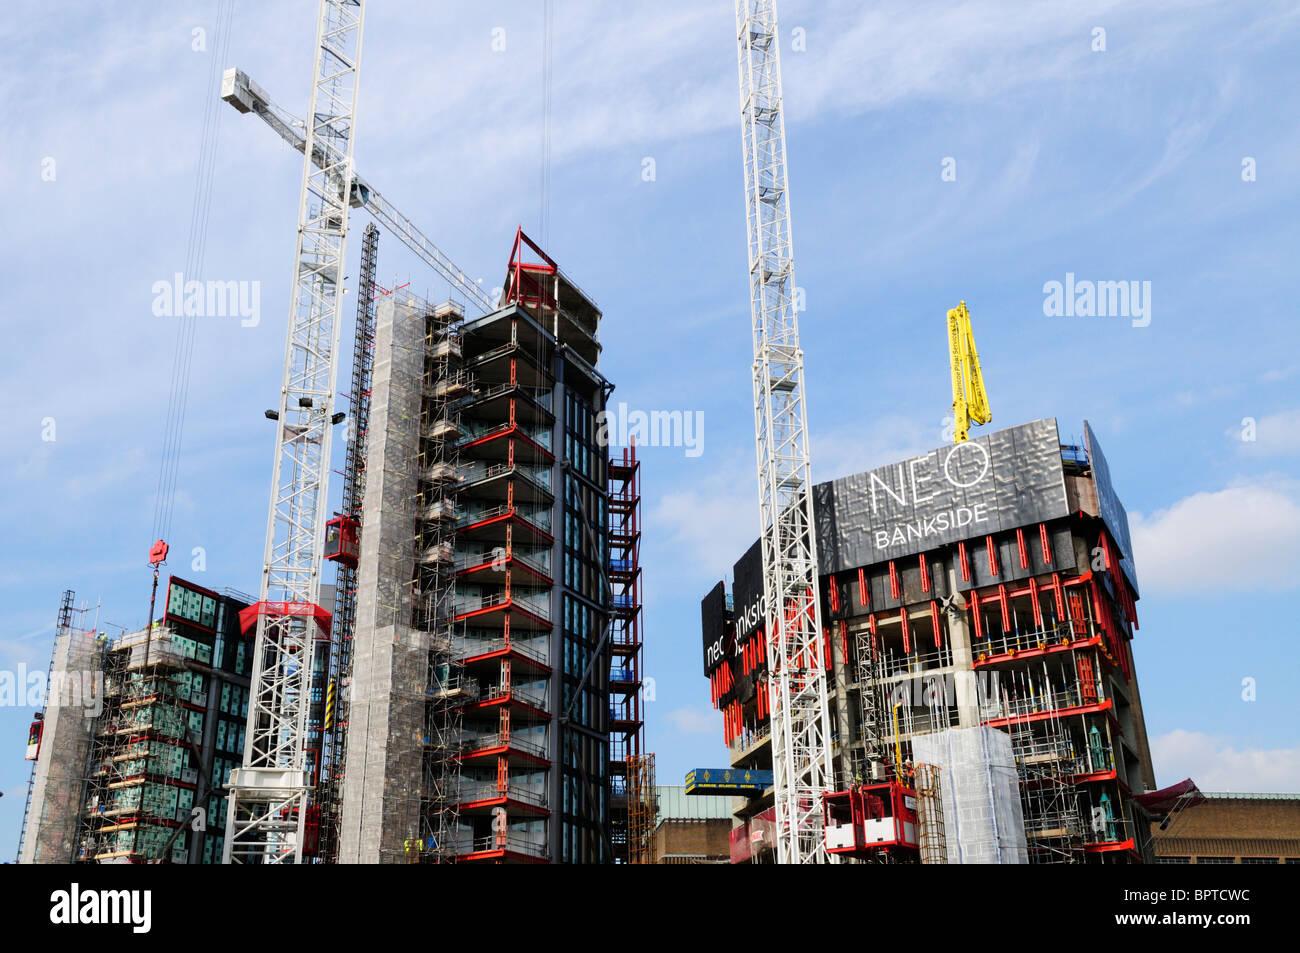 NEO Bankside building site, Southwark, London, England, UK - Stock Image